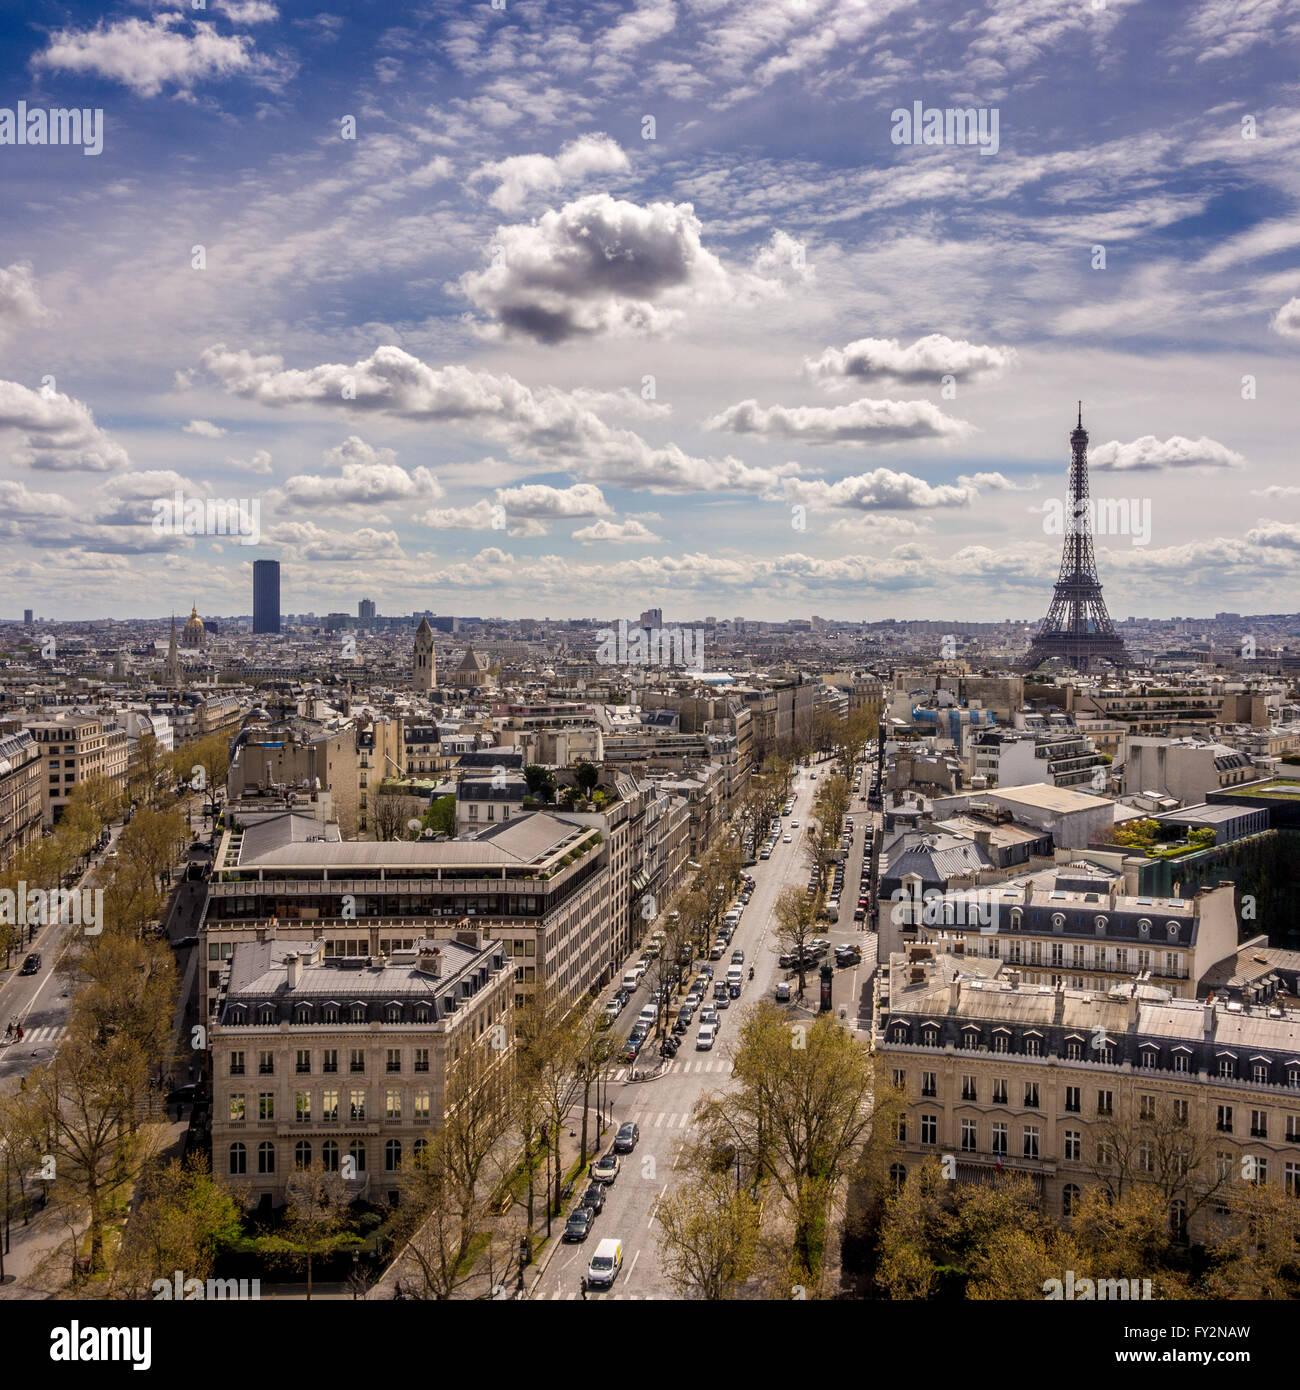 Blick auf den Eiffelturm und Montparnasse-Turm aus dem Arc de Triomphe, Paris, Frankreich. Stockbild